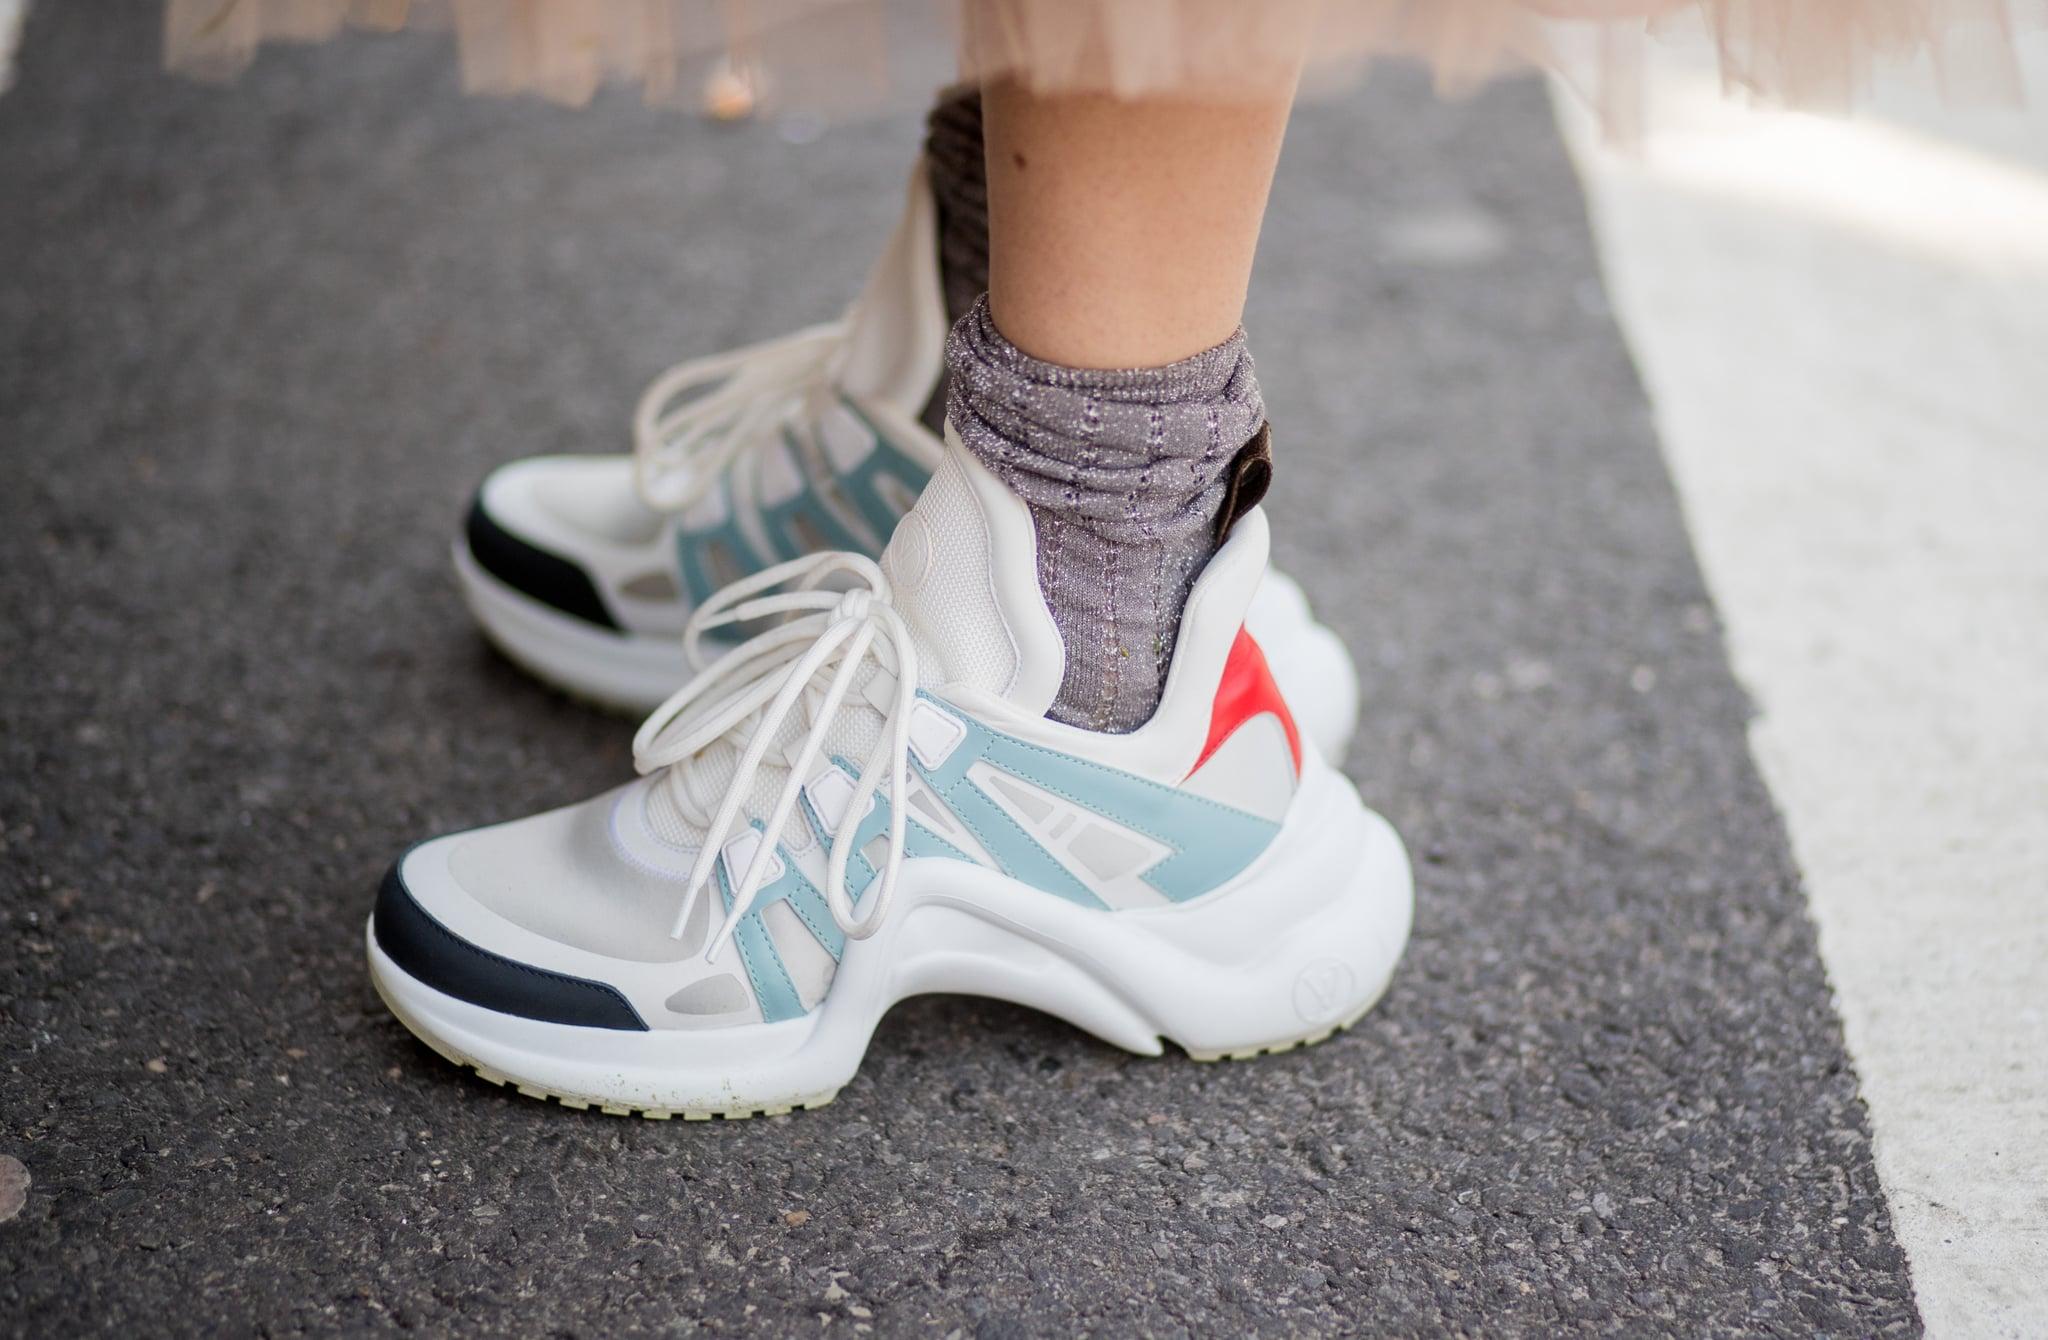 Dad Sneakers at Fashion Week Fall 2018